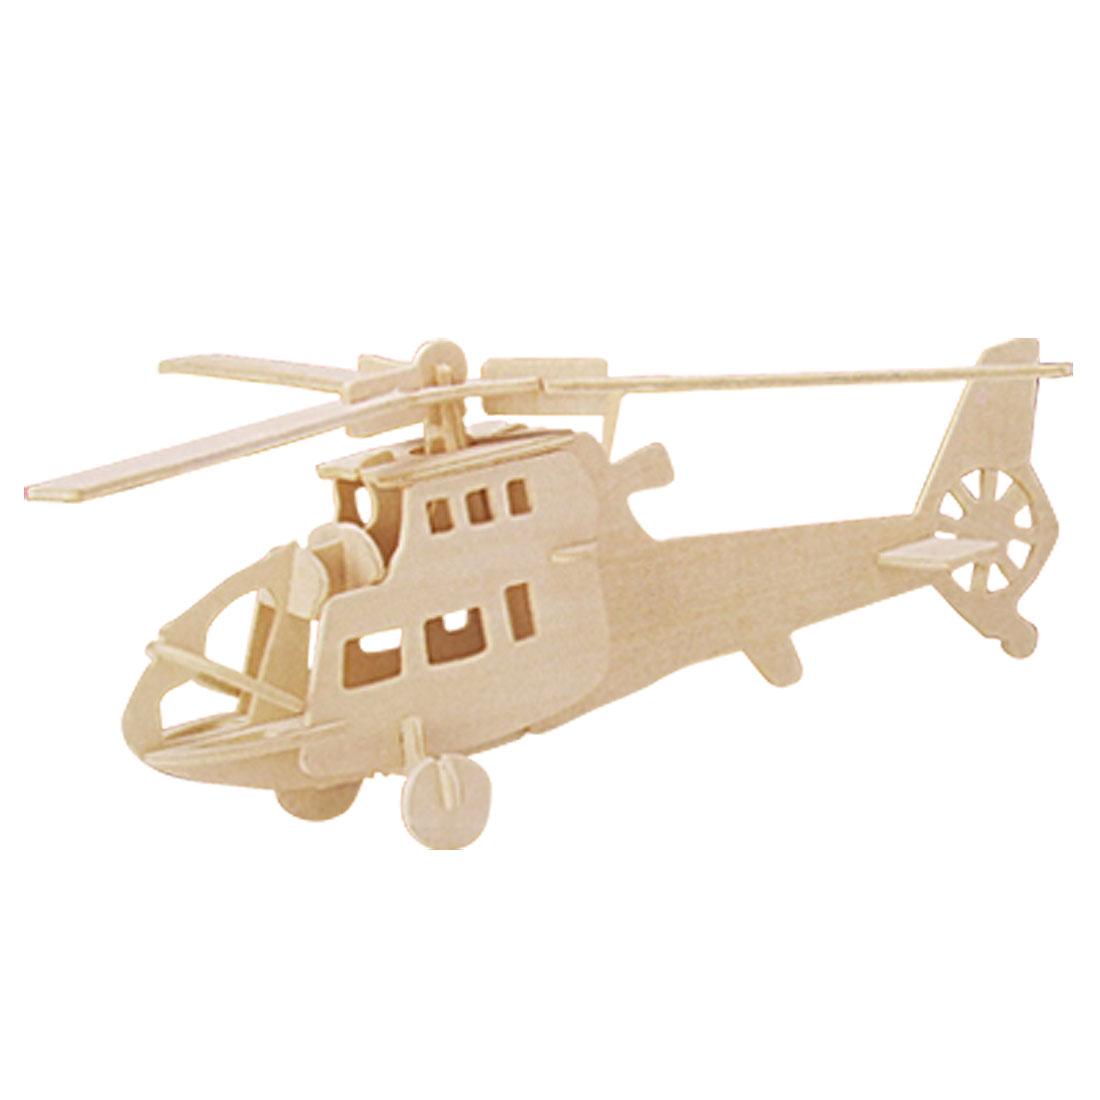 DIY Wooden Fighter Plane Battleplane Model Puzzle Toy